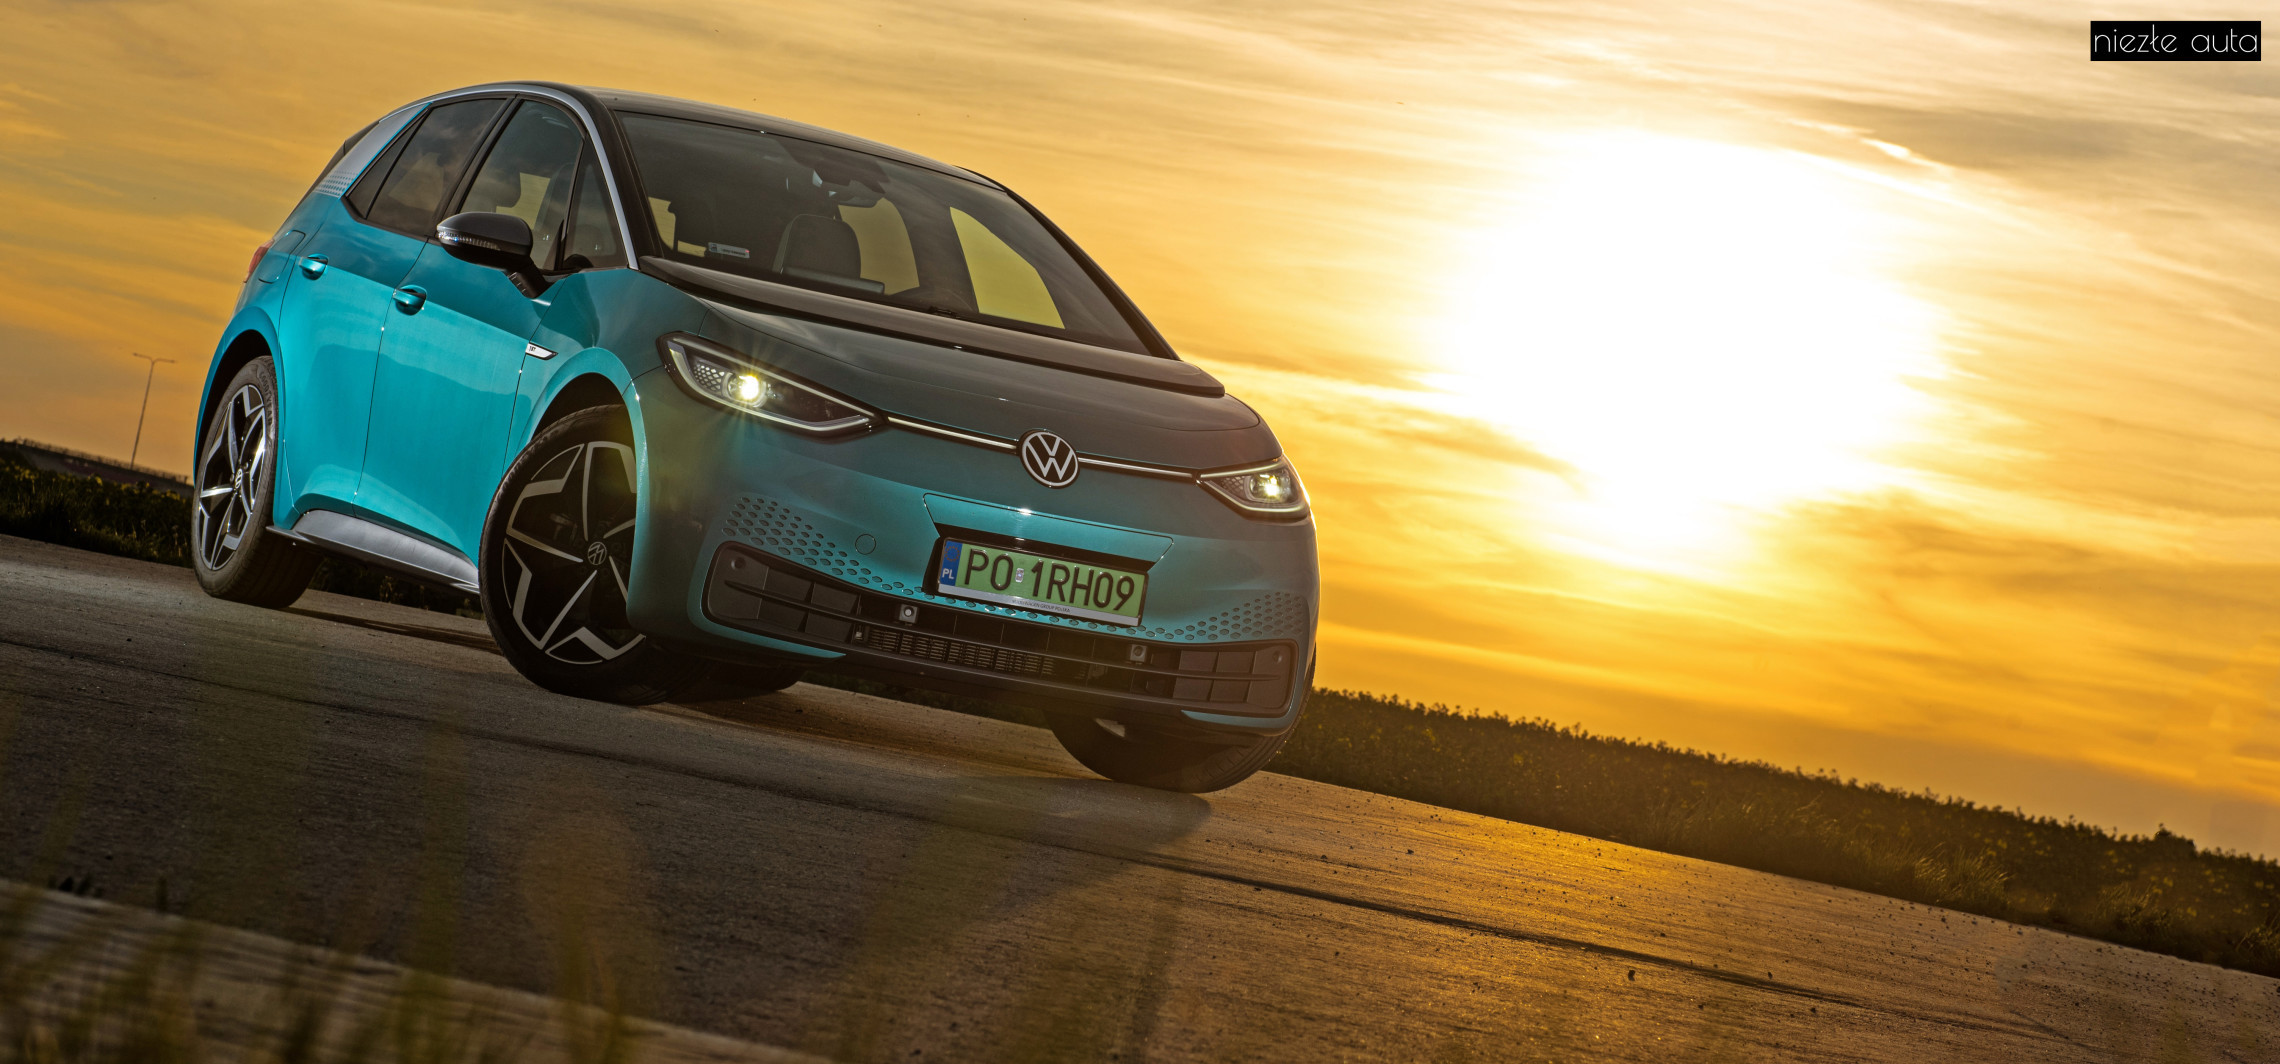 Test: Volkswagen ID.3 - nowa era nadeszła?